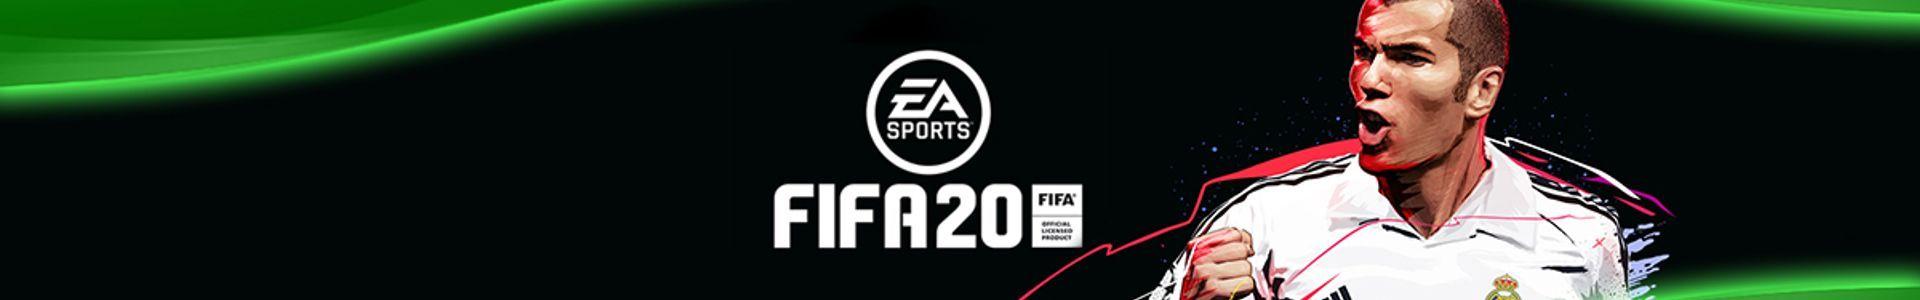 FIFA 20 Points